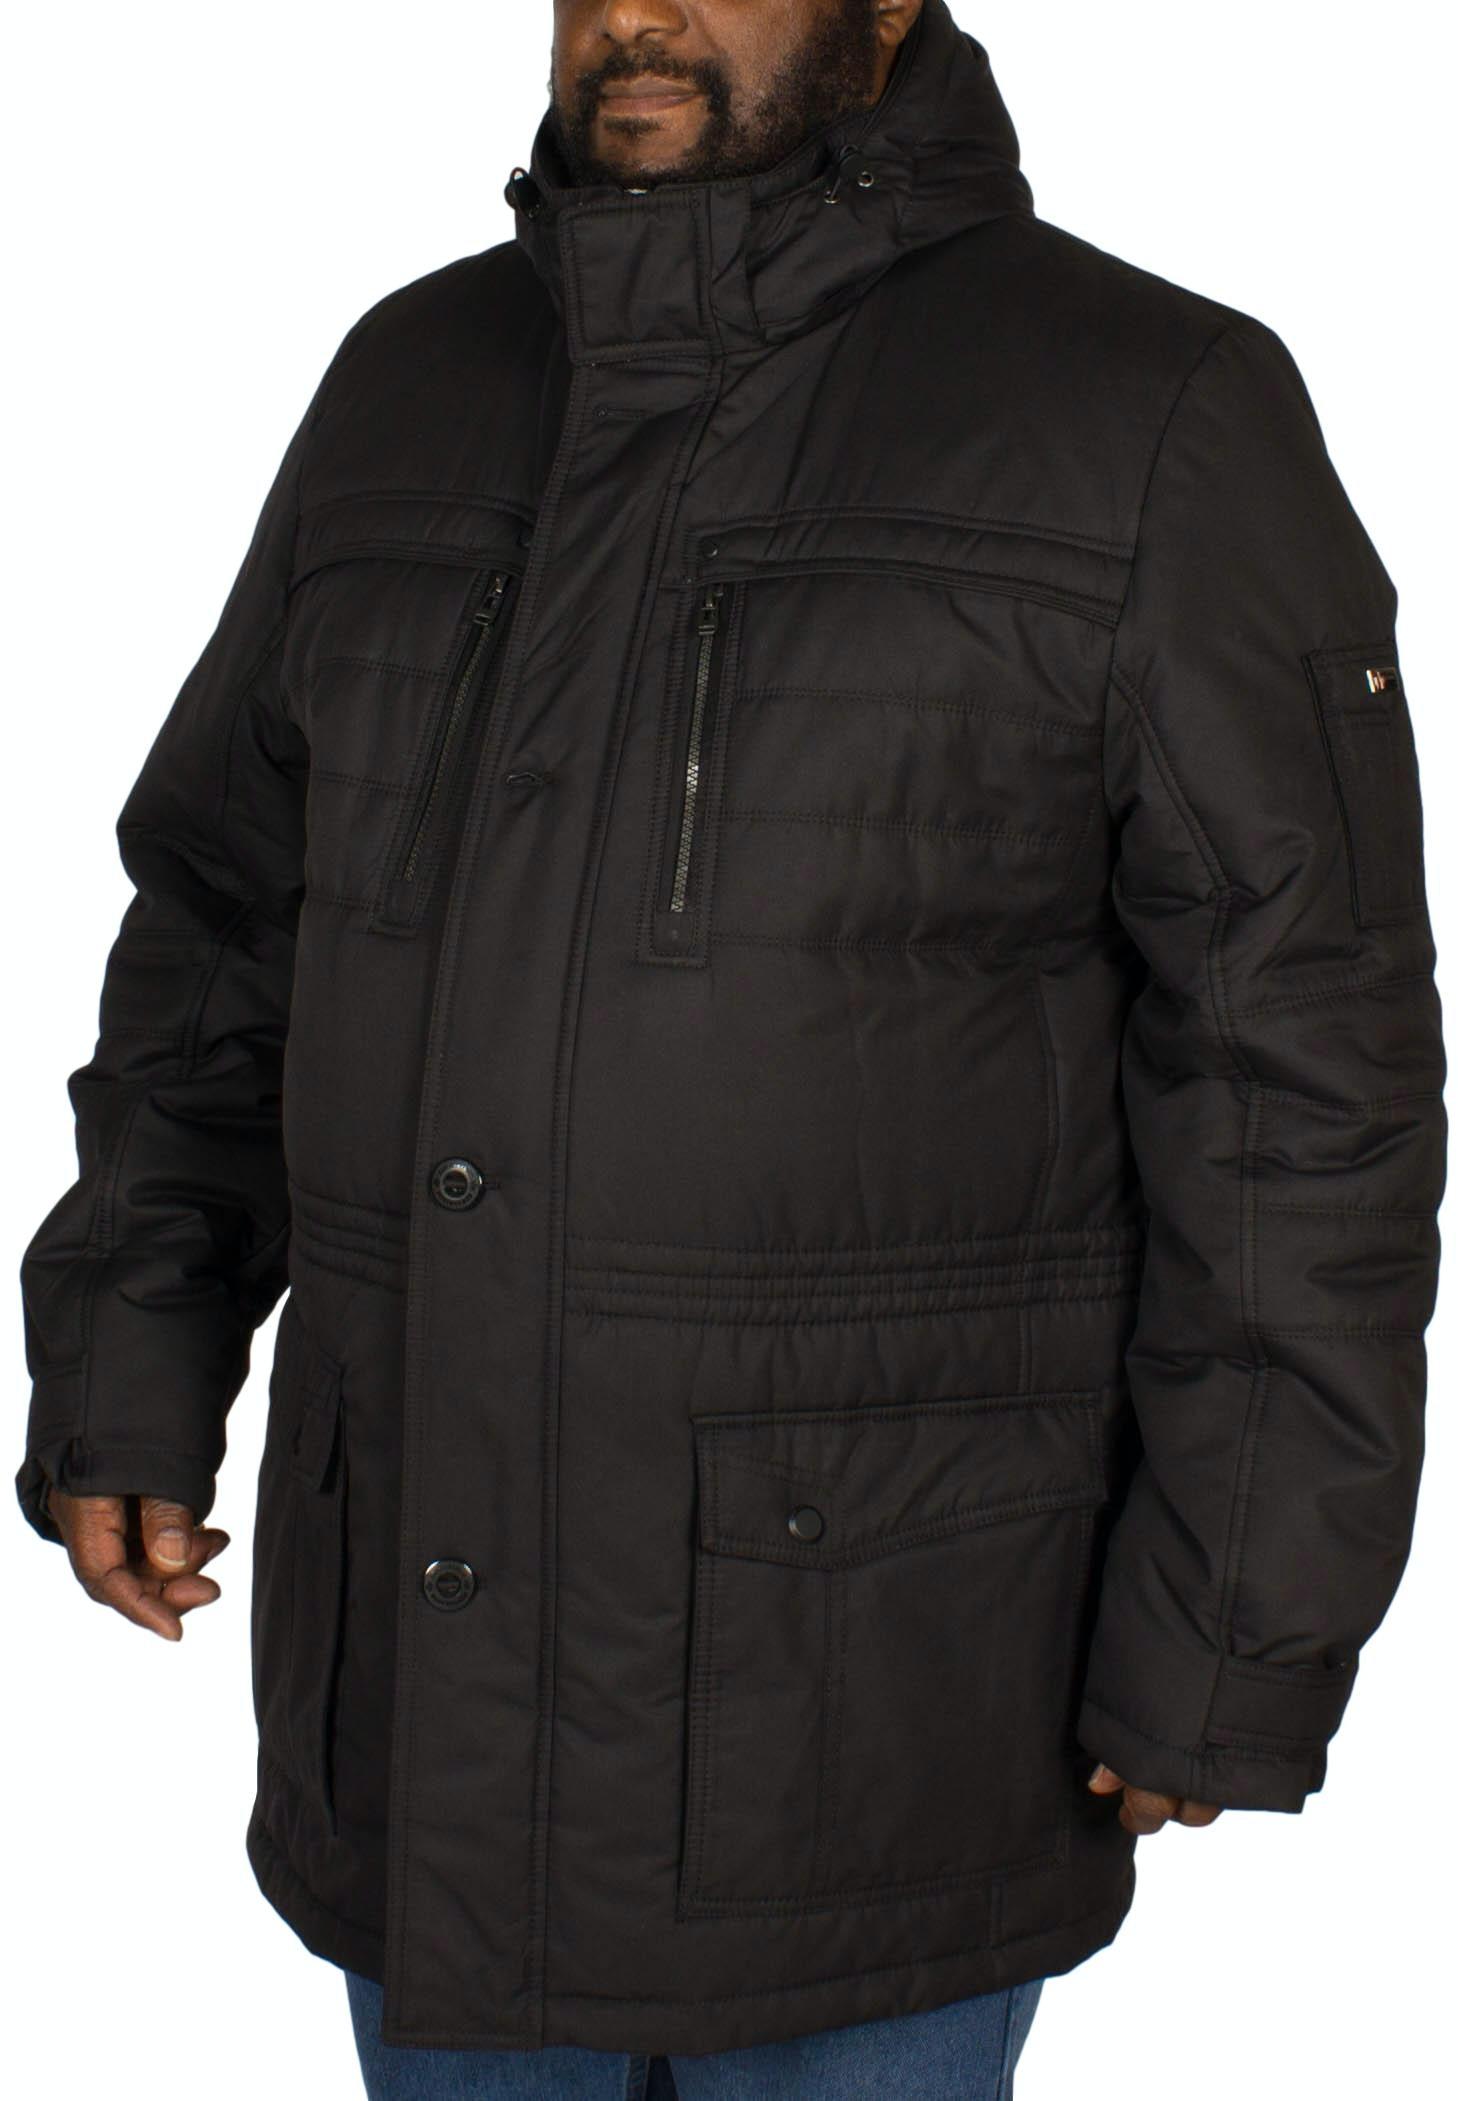 Cabano Performance Parka Coat Black